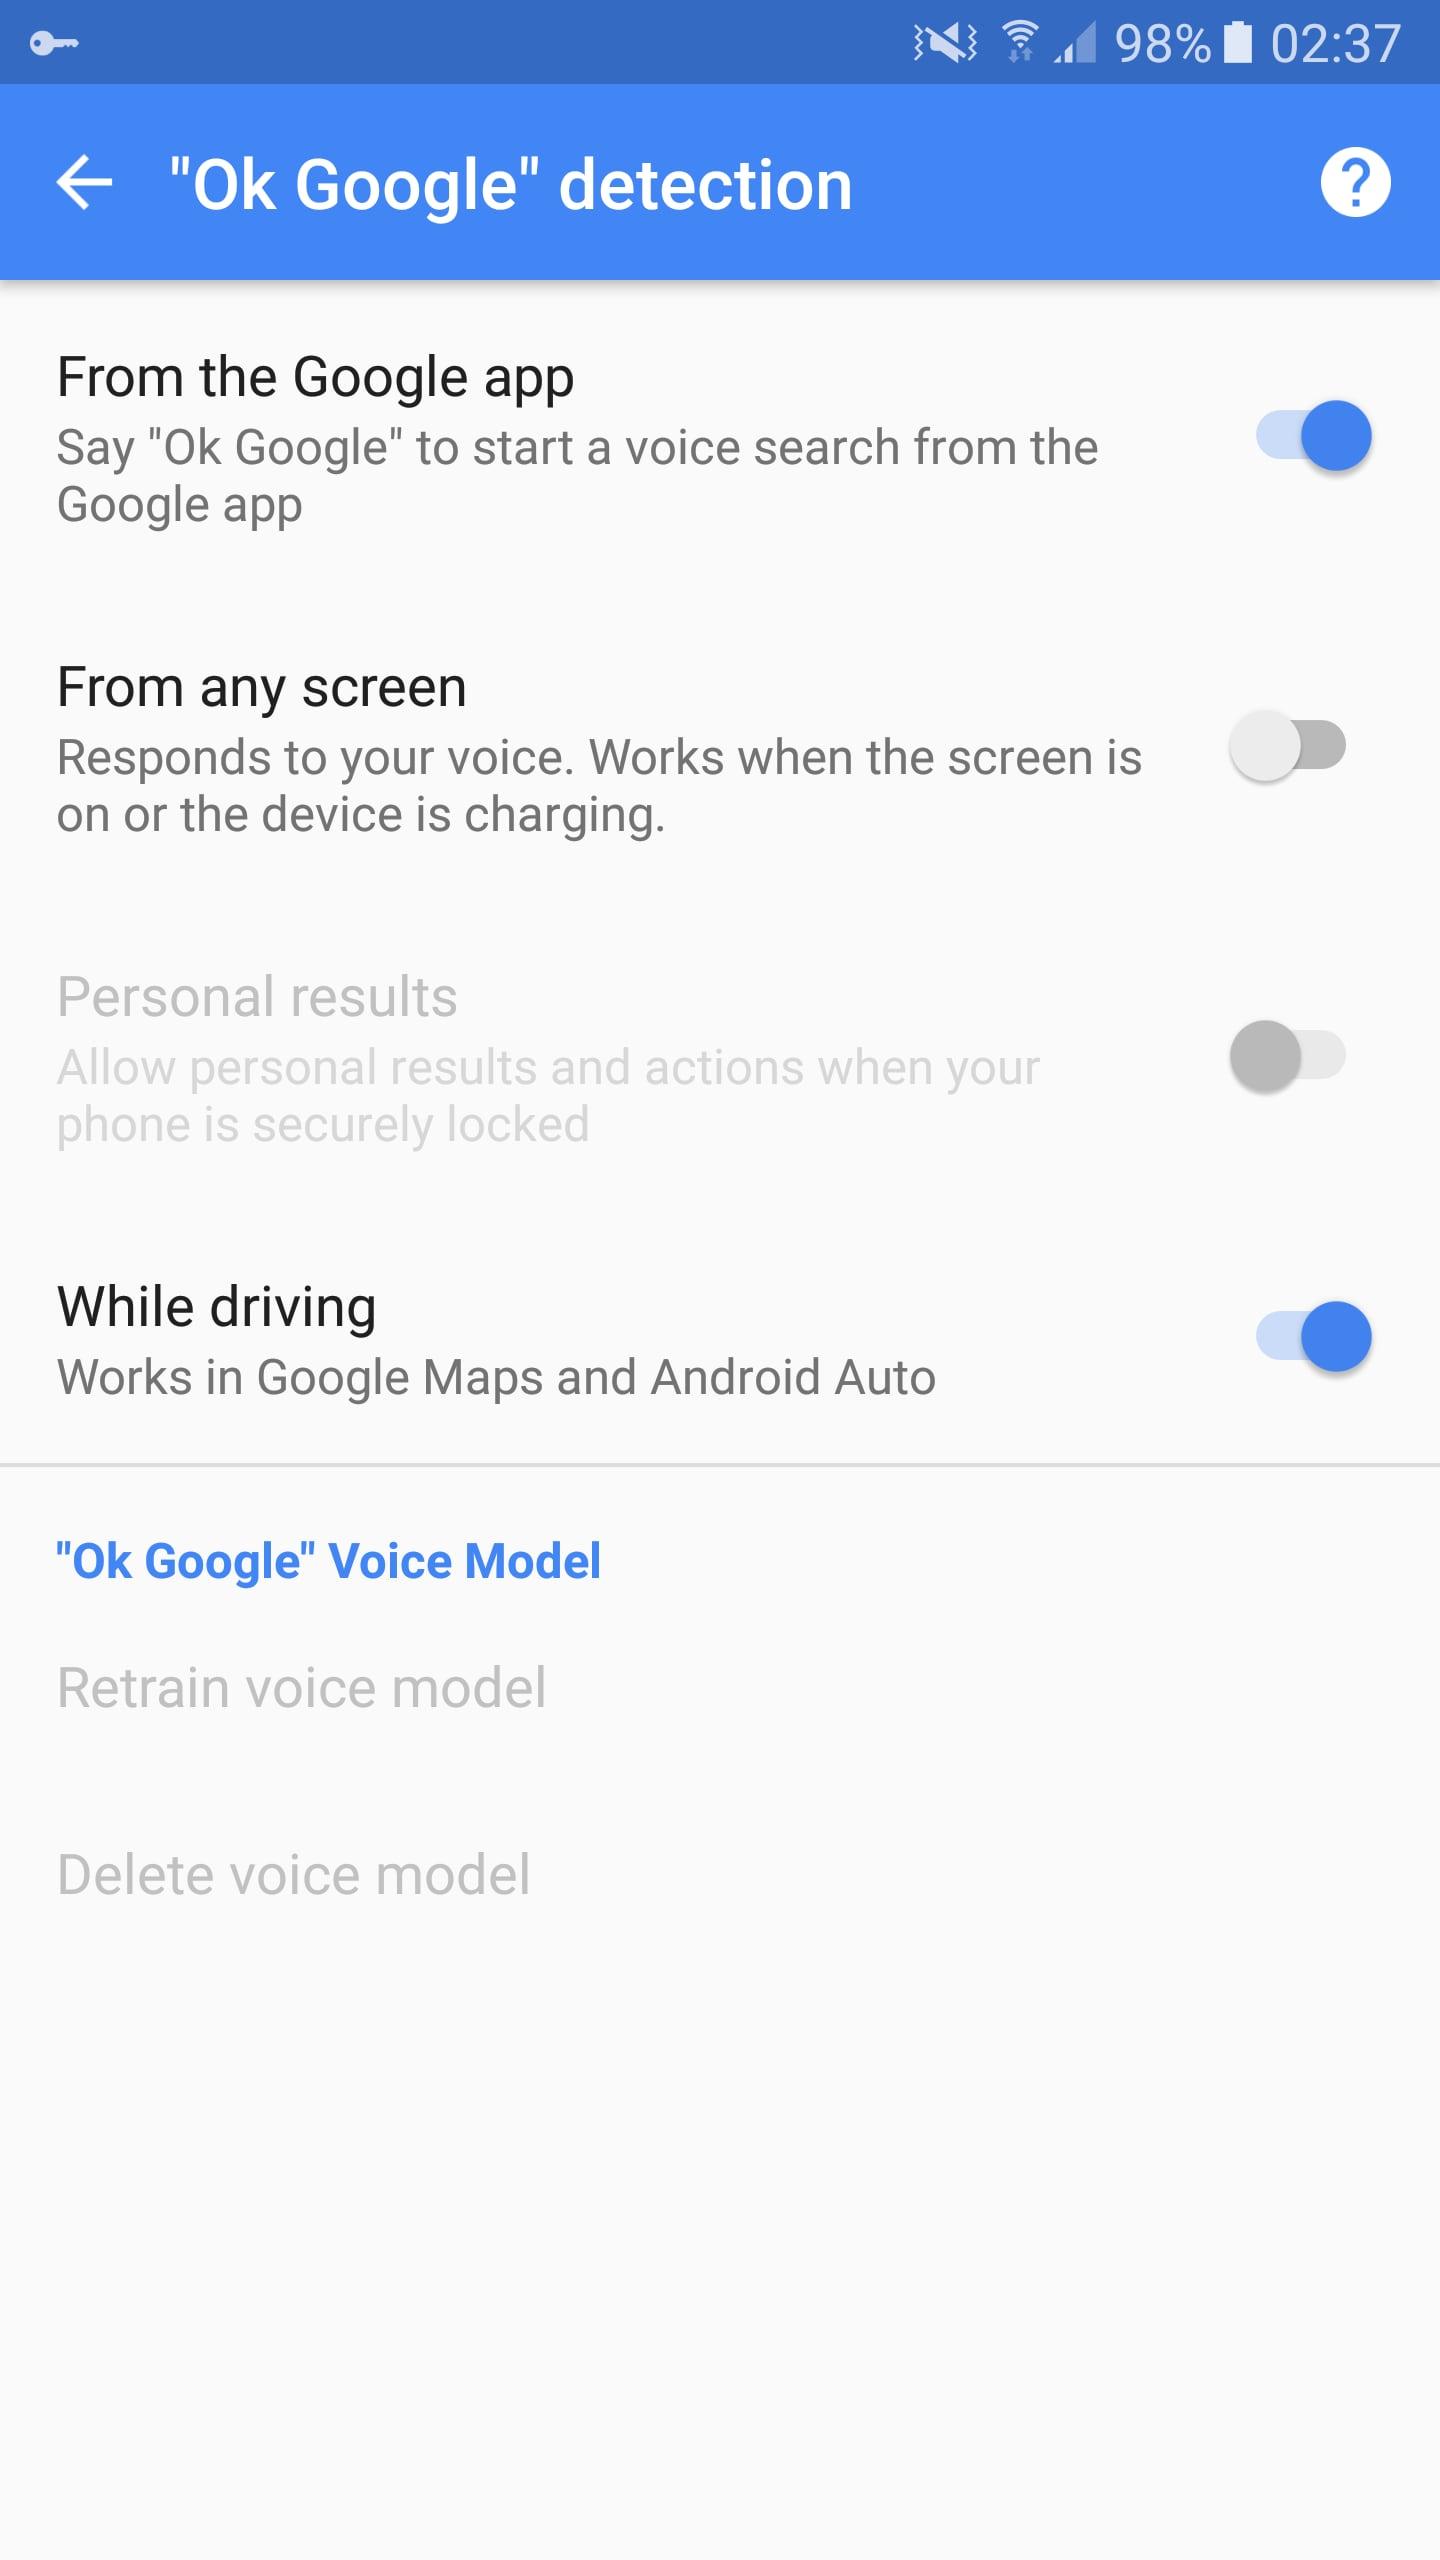 ok-google-android-auto